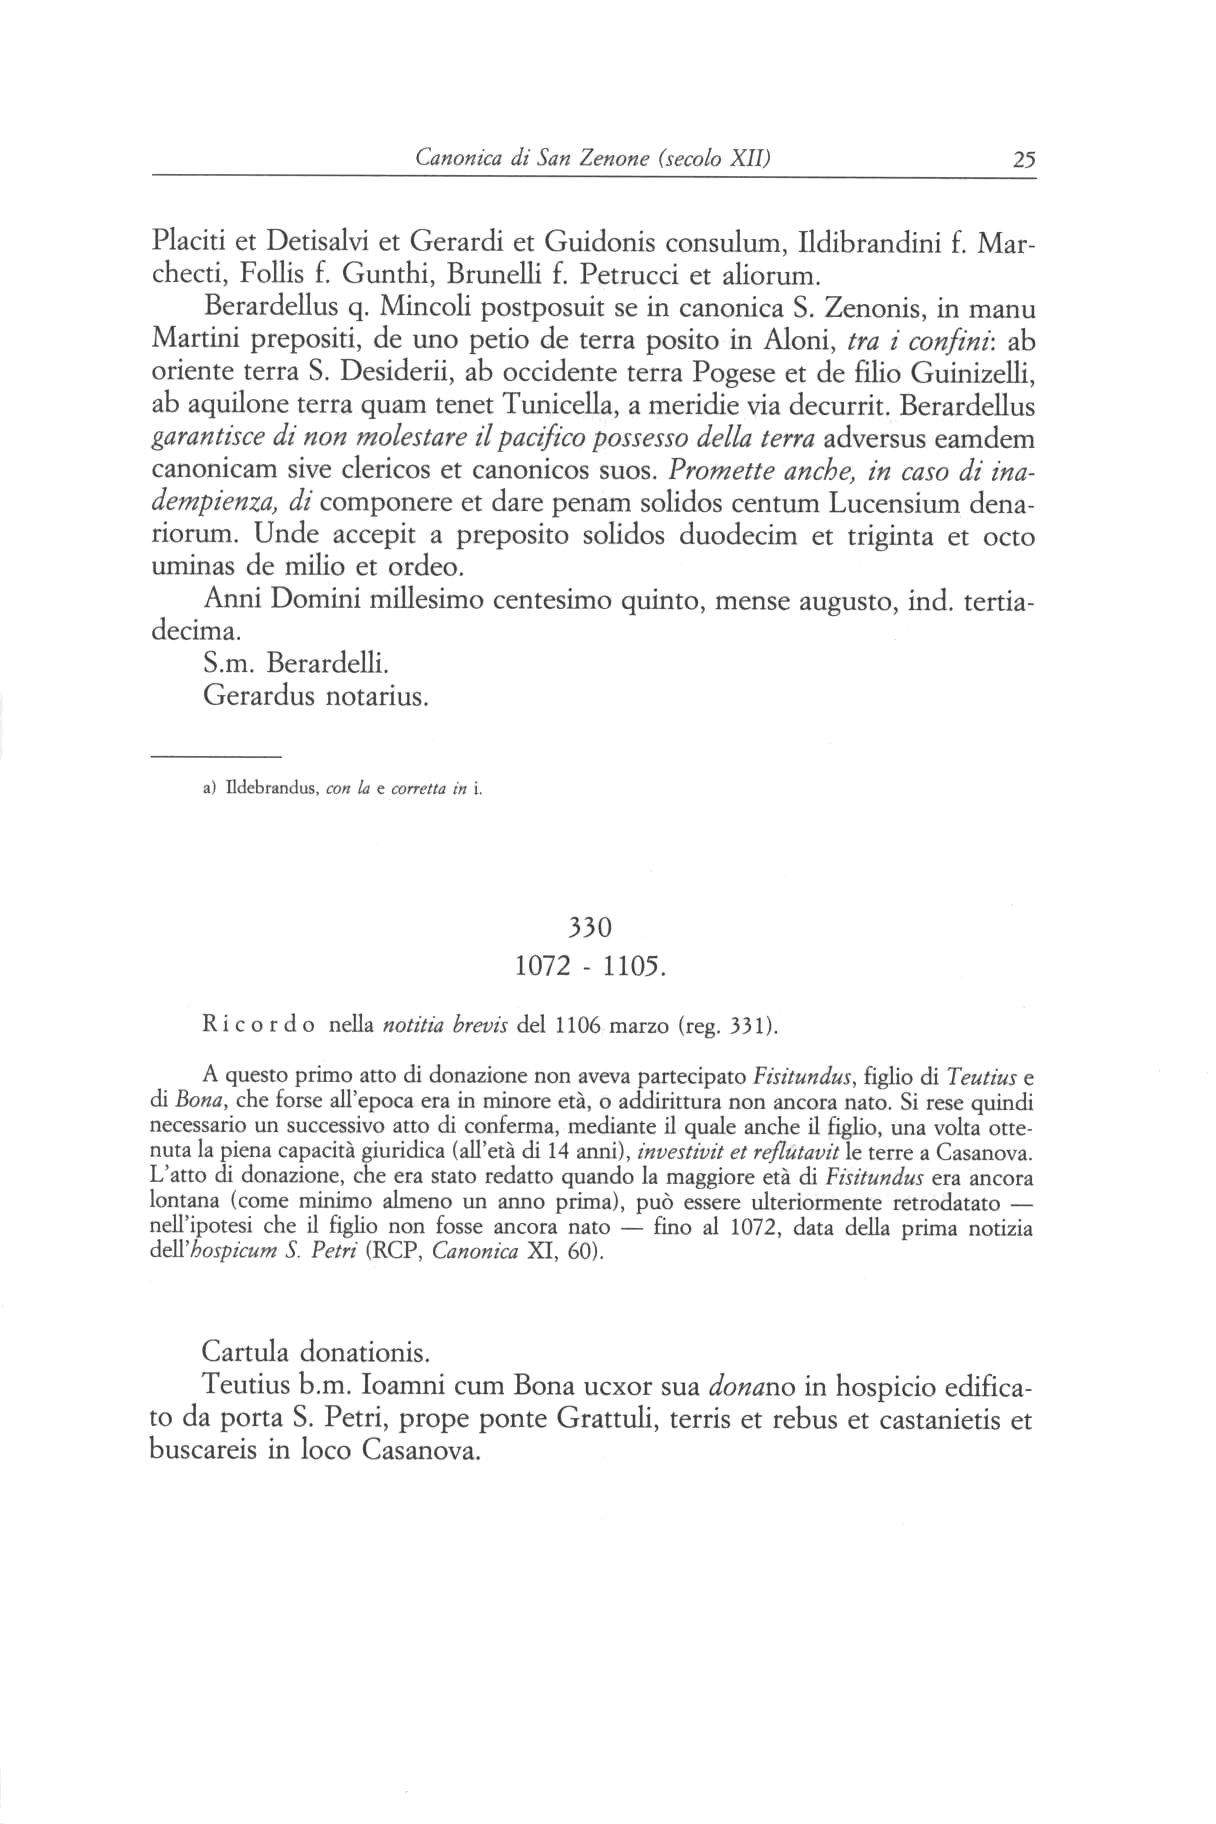 Canonica S. Zenone XII 0025.jpg